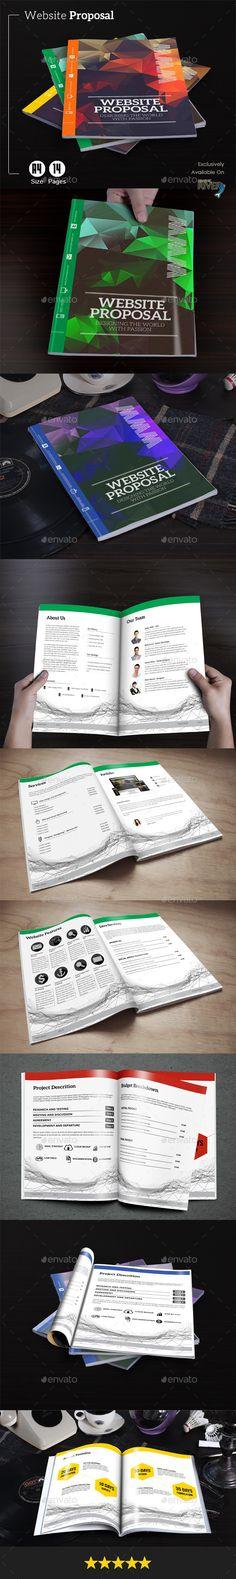 Website Proposal Template #design Download: http://graphicriver.net/item/website-proposal/11824489?ref=ksioks